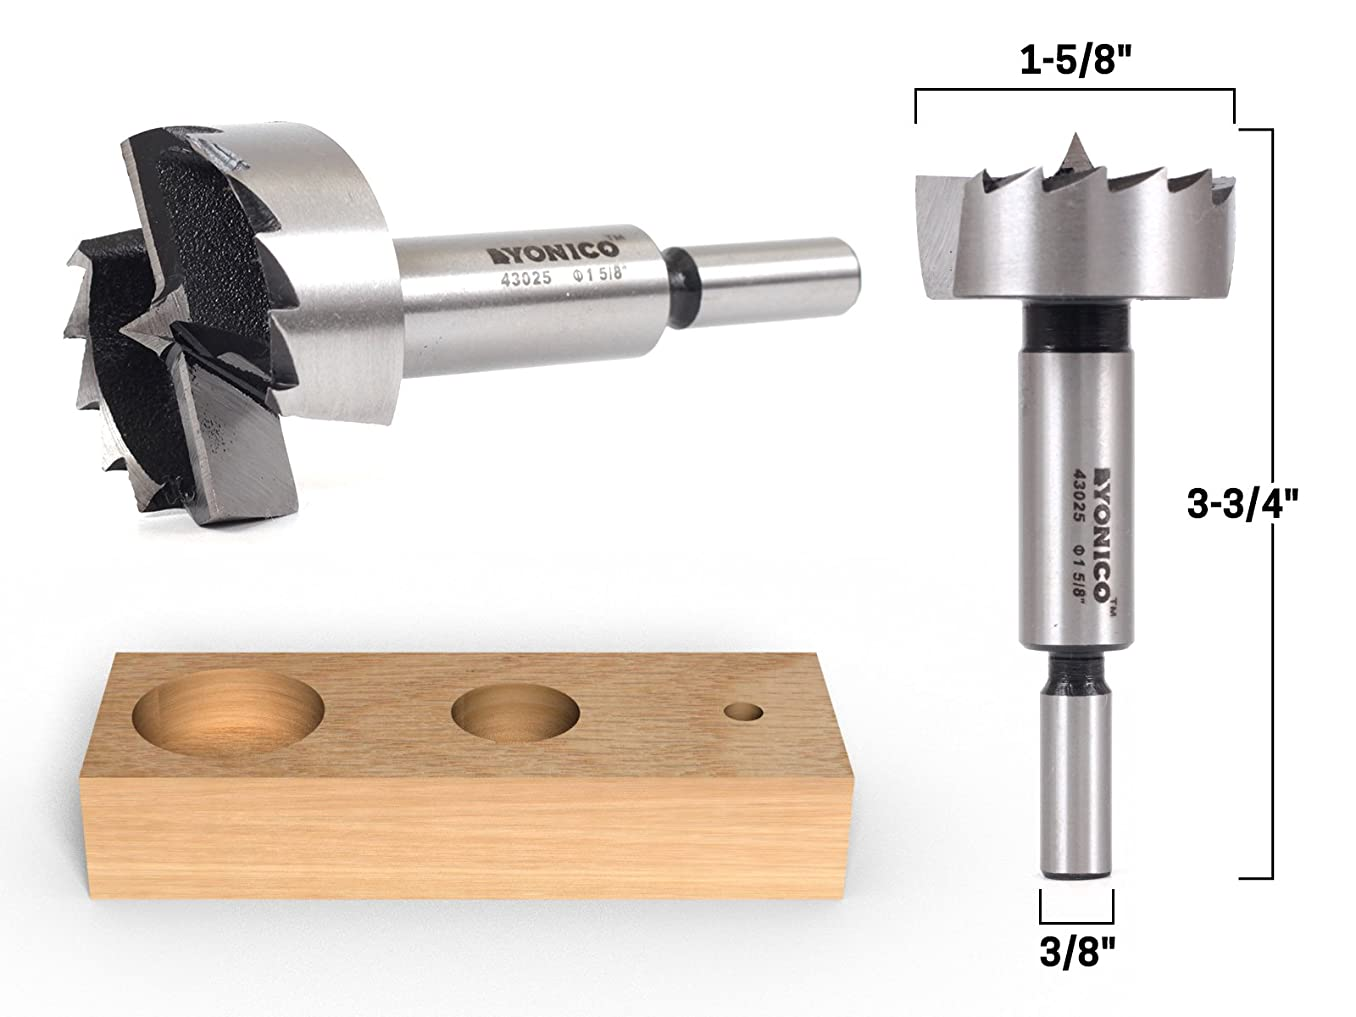 Yonico 43025S 1-5/8-Inch Diameter Steel Forstner Drill Bit 3/8-Inch Shank